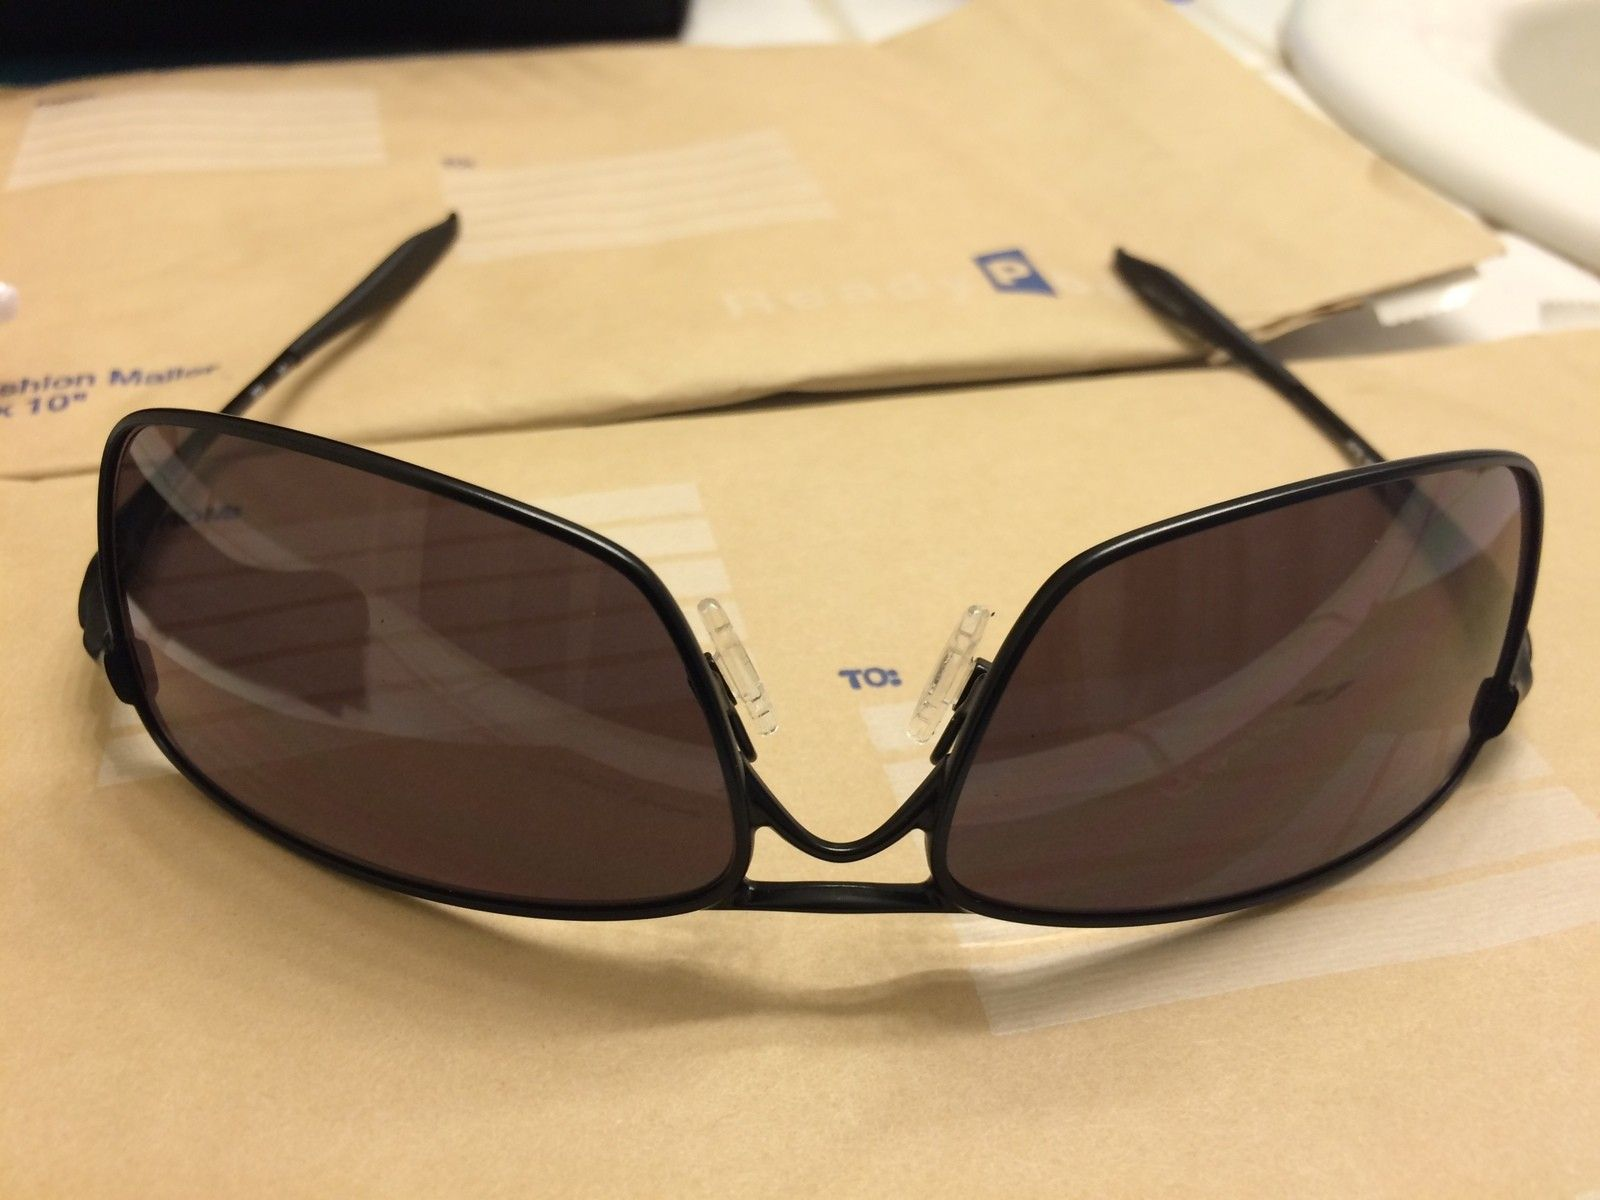 Crosshair 2.0 Black - New -Under $80 - 2015-07-01 21.17.12.jpg